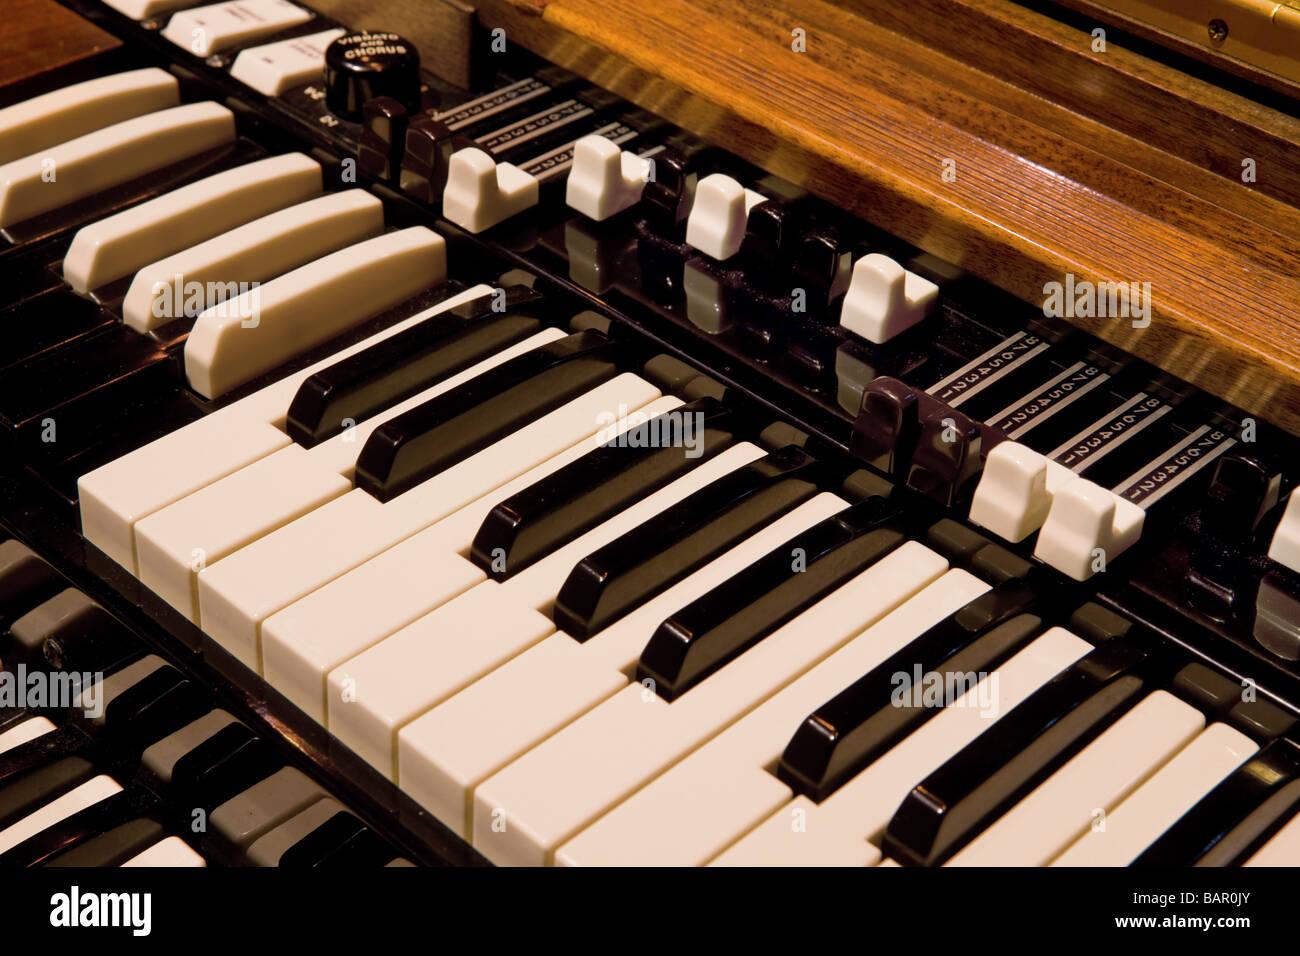 Closeup image of Hammond B3 Organ Keyboard with Drawbars Stock Photo